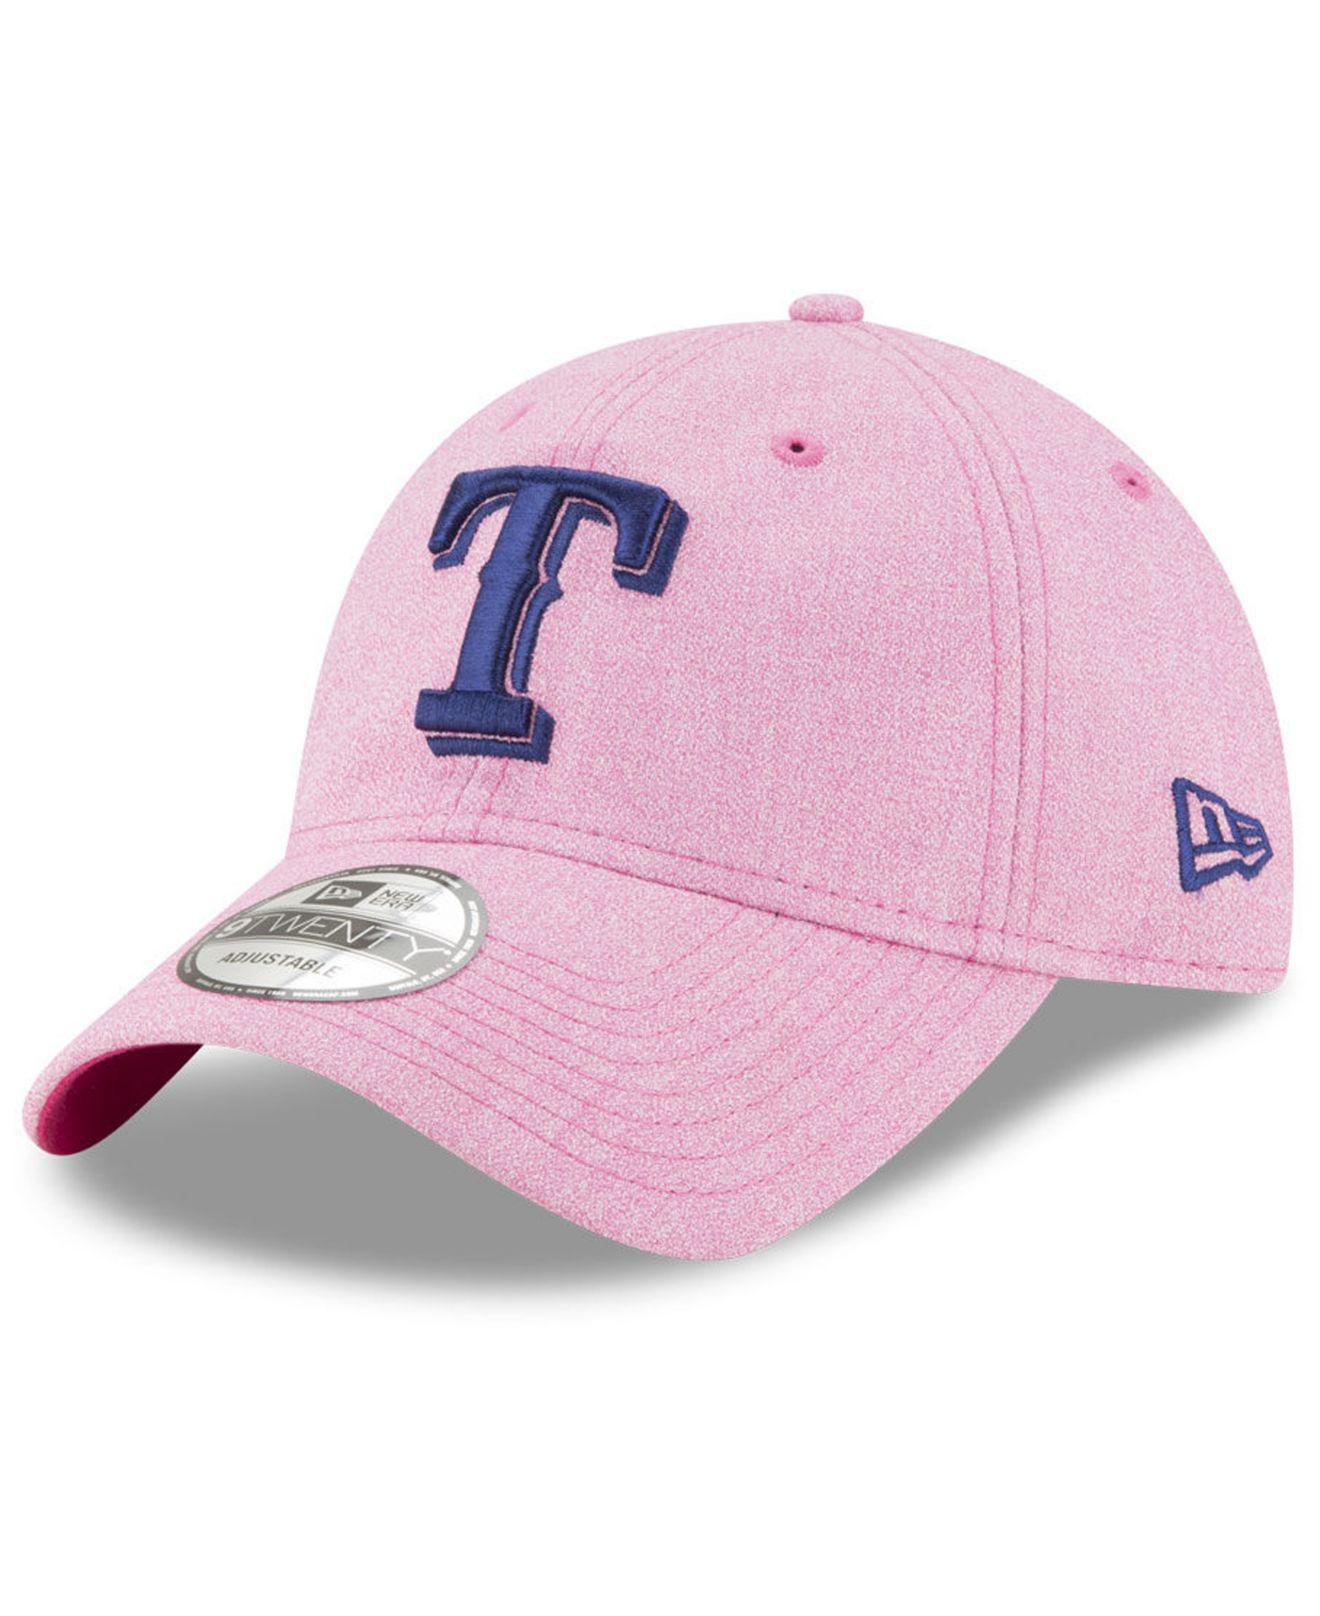 sports shoes 8492f 5c9da best texas rangers new era mlb x wilson 9twenty cap 88eef 37ae0  hot ktz.  womens pink texas rangers mothers day 9twenty cap f4fe3 b2a75